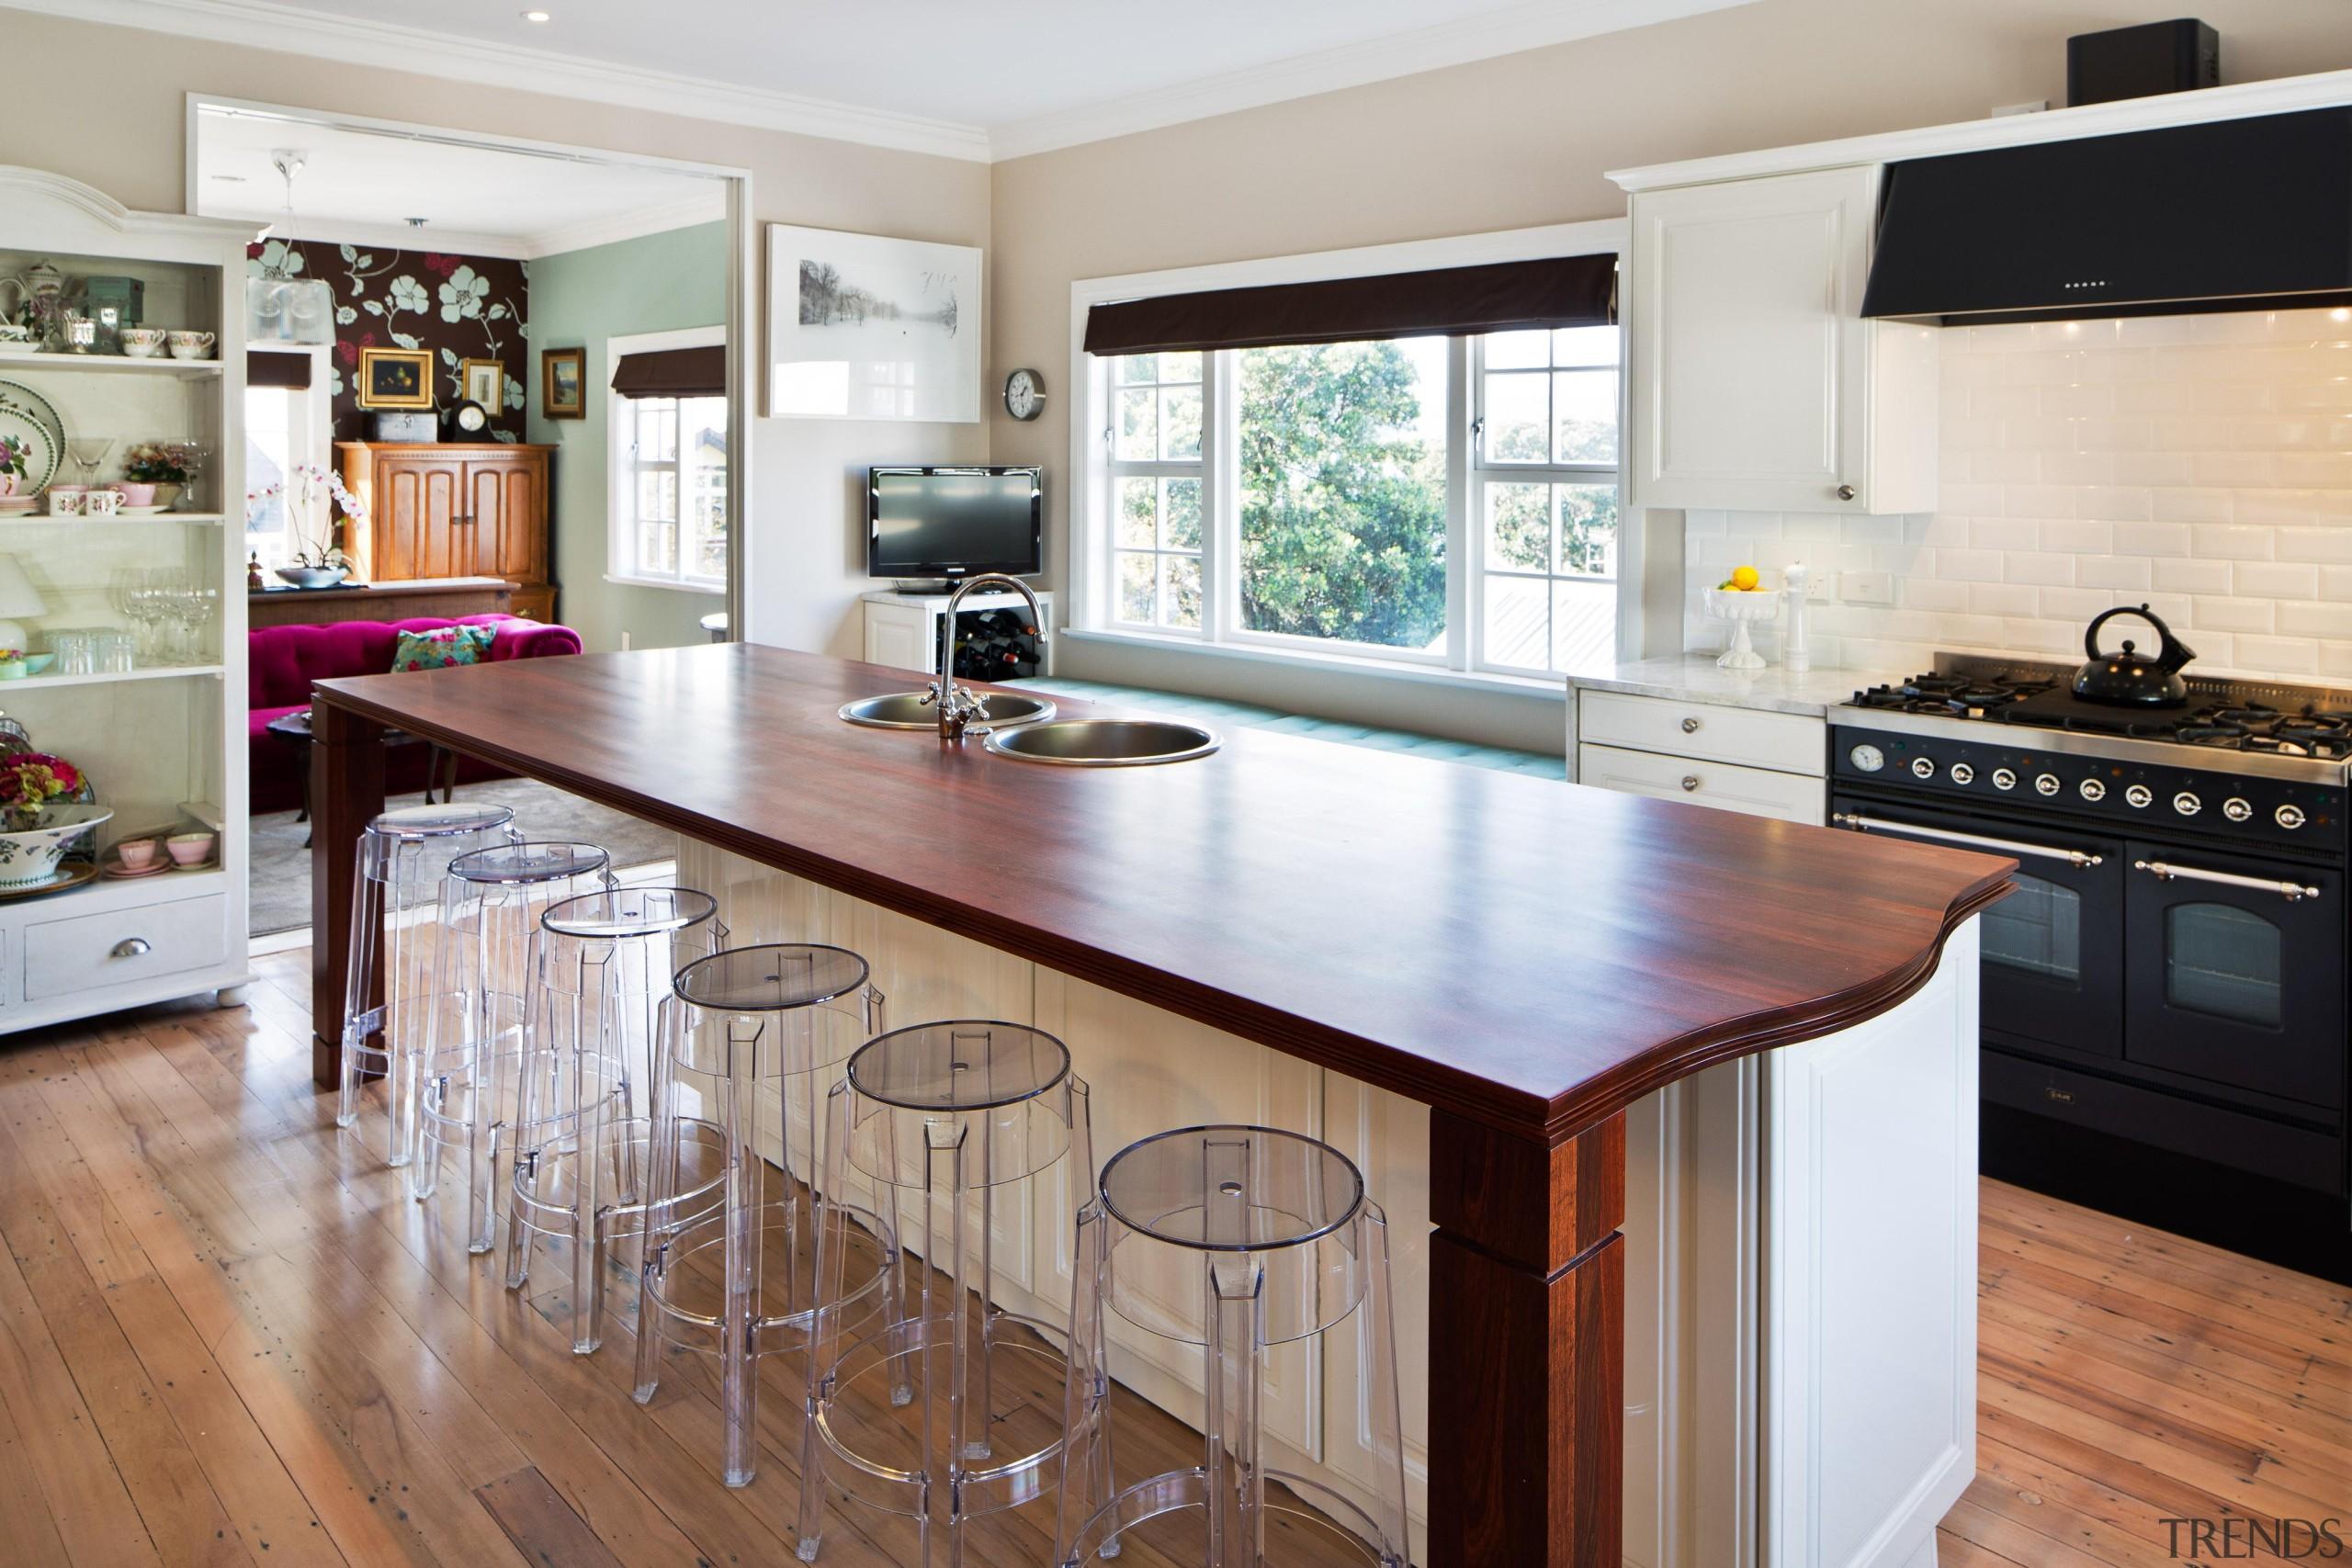 burnham17.jpg - burnham17.jpg - cabinetry   countertop   cabinetry, countertop, cuisine classique, floor, flooring, hardwood, interior design, kitchen, laminate flooring, real estate, room, wood flooring, gray, white